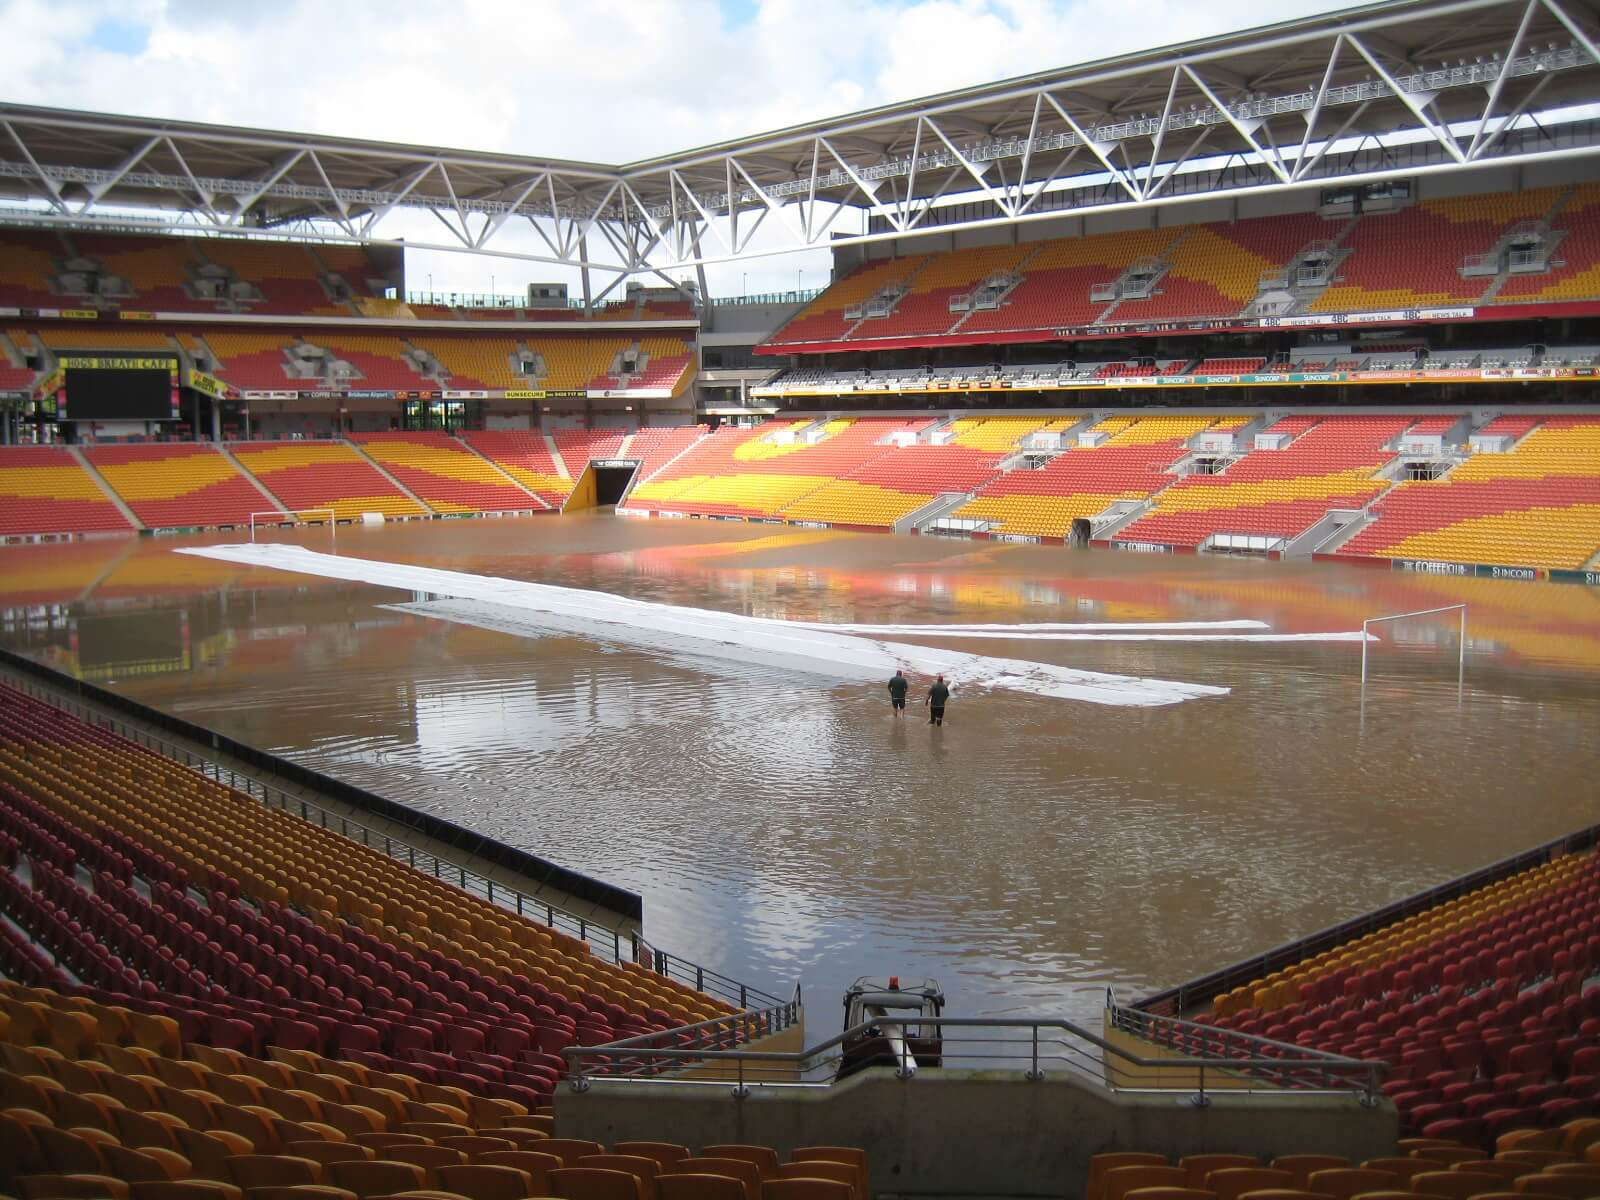 suncorp stadium - photo #35